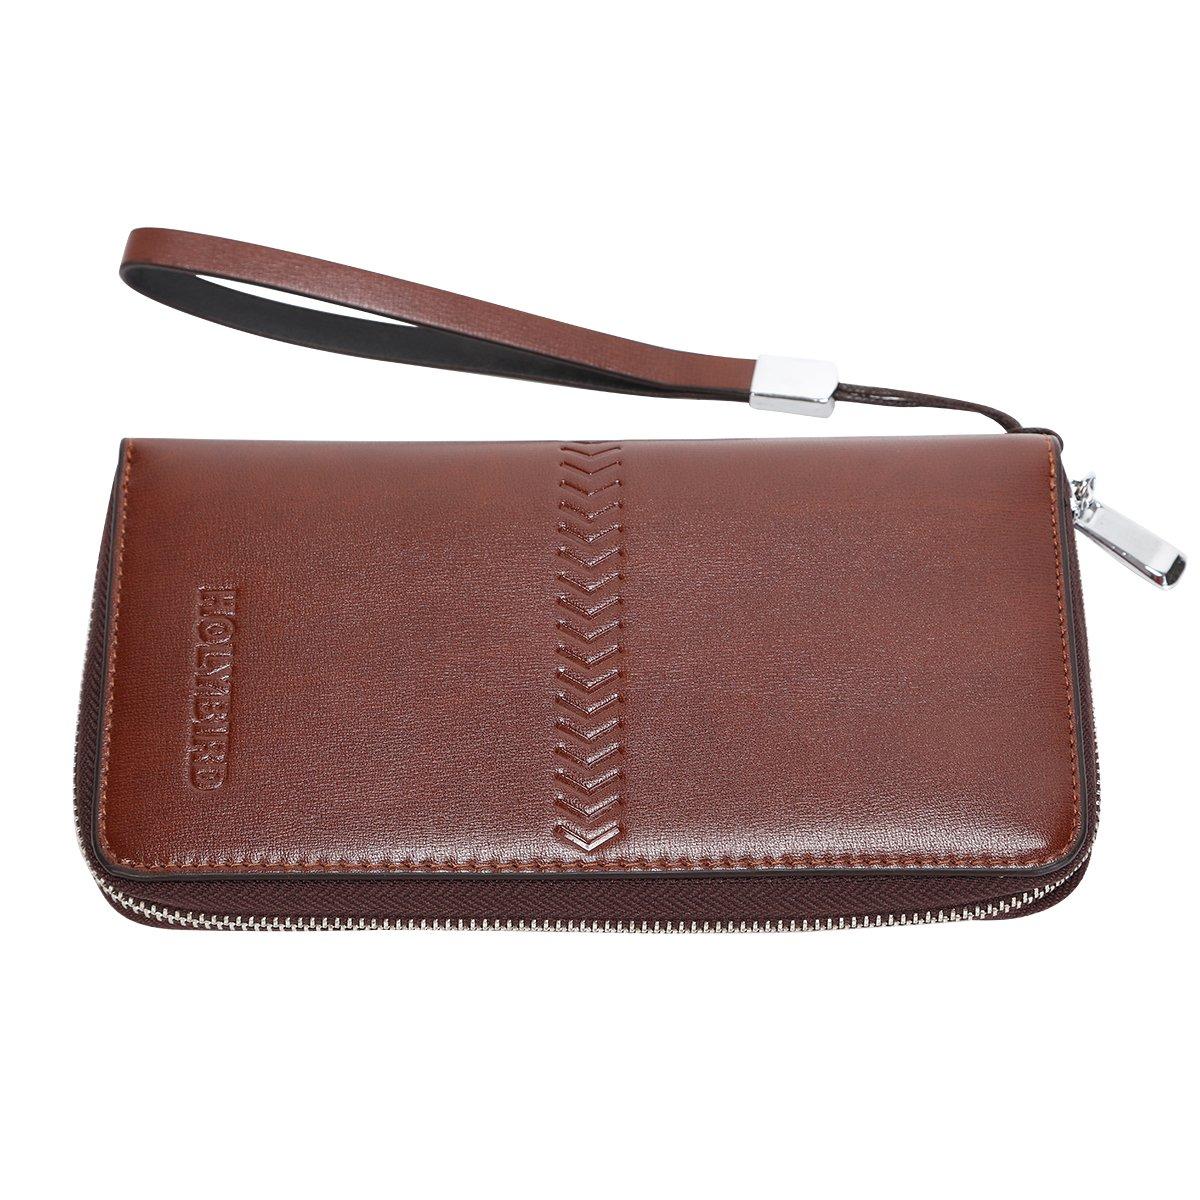 Mens Clutch Genuine Leather Handbag Organizer Checkbook Wallet Card Case by HOLYBIRD (Image #2)